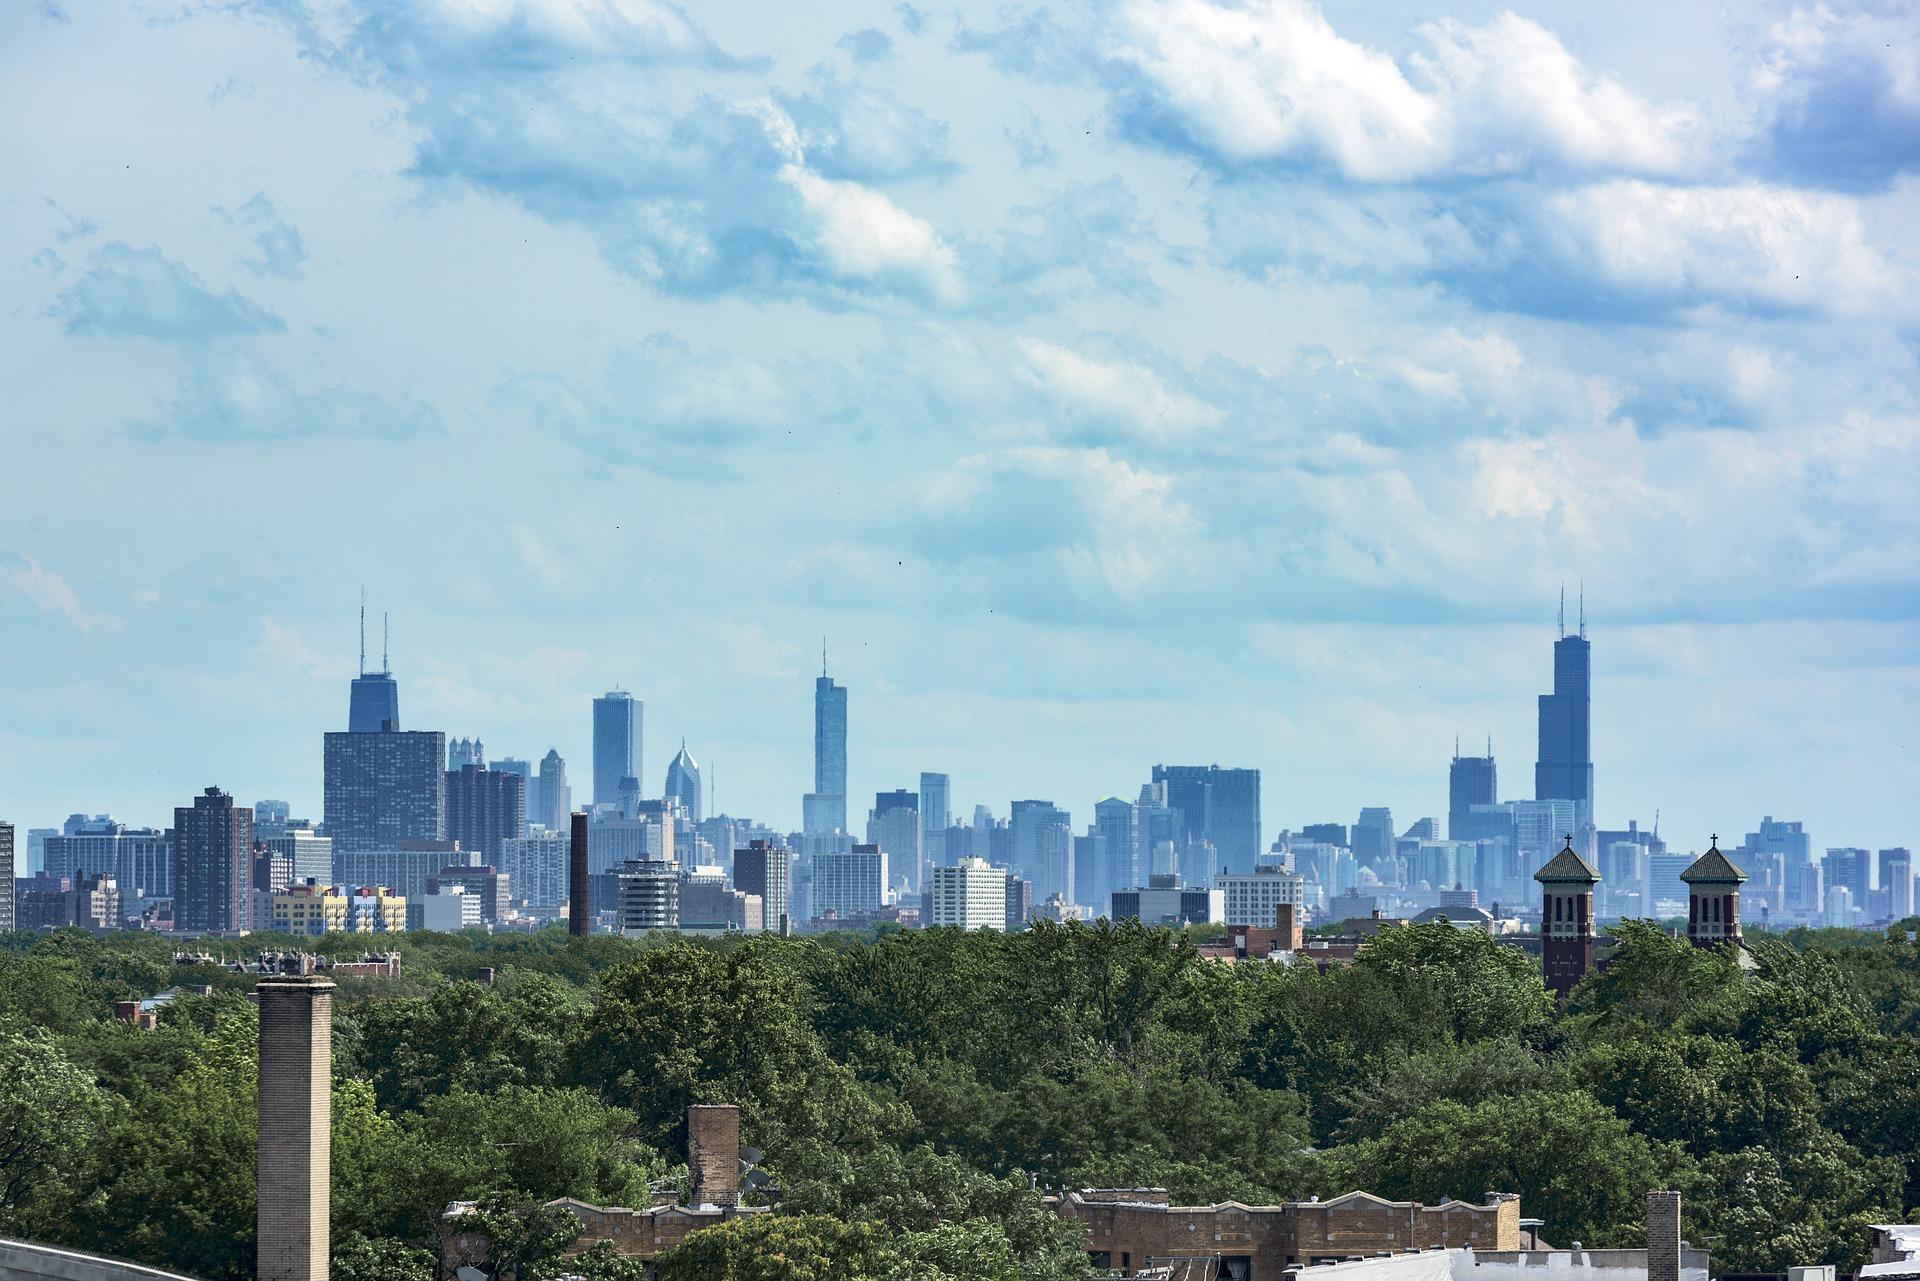 chicago-853130_1920